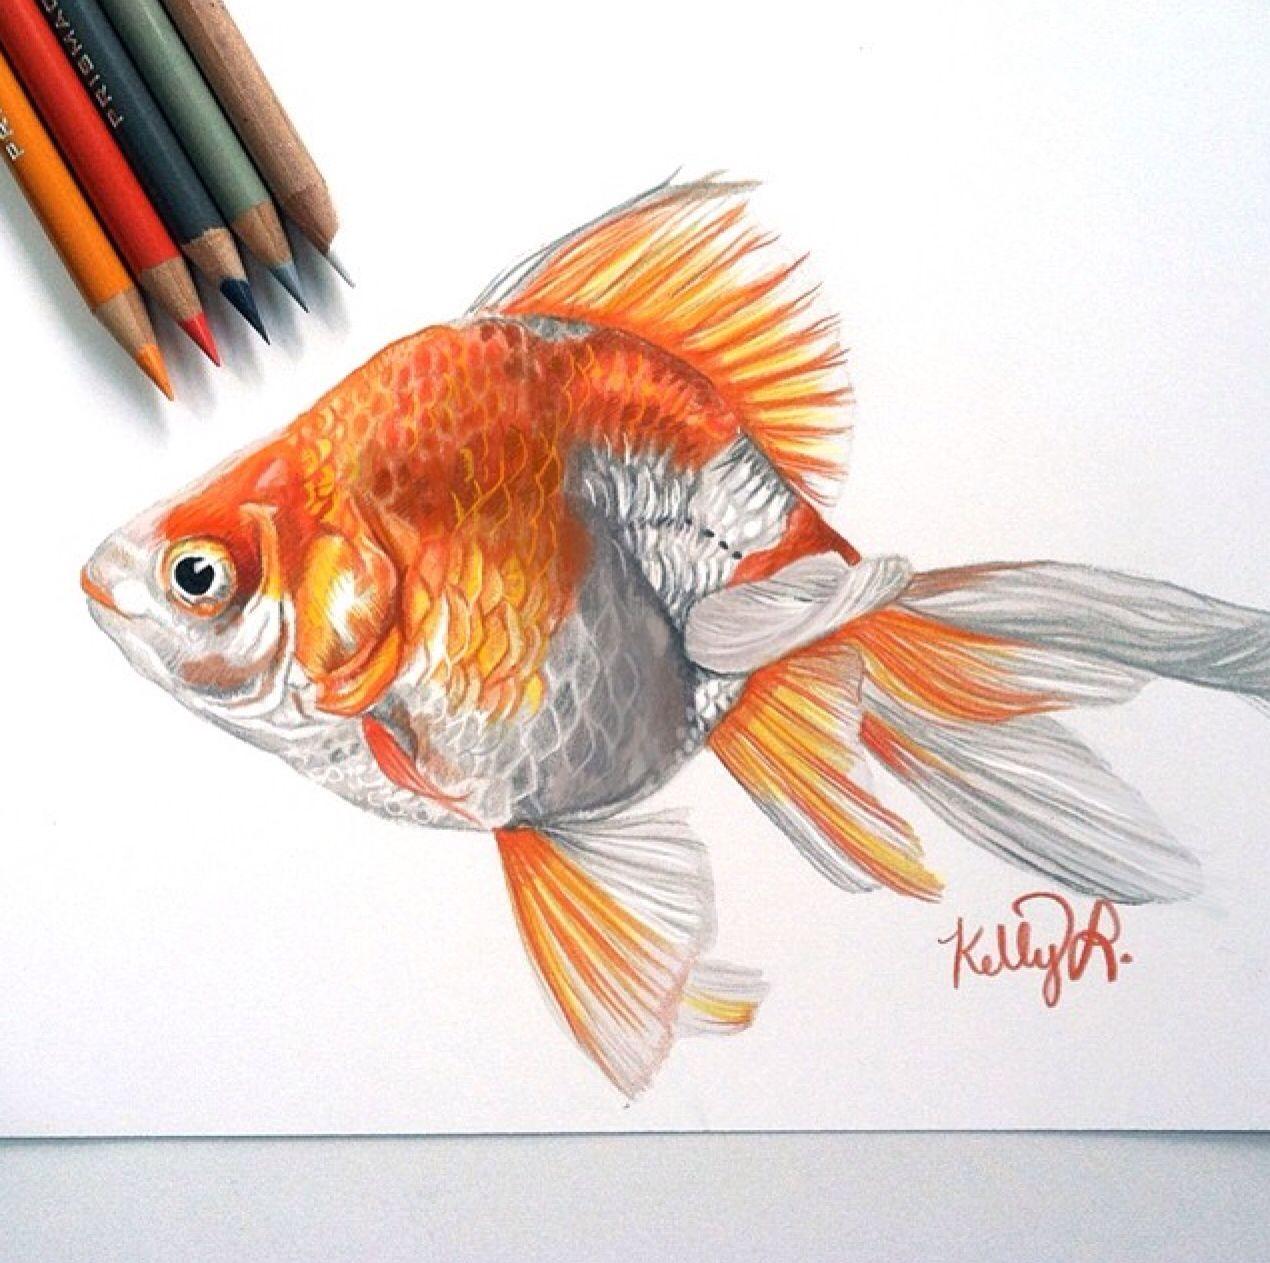 Kelly Lahar Desenhos Realistas Desenhos Coloridos Pintura Animal